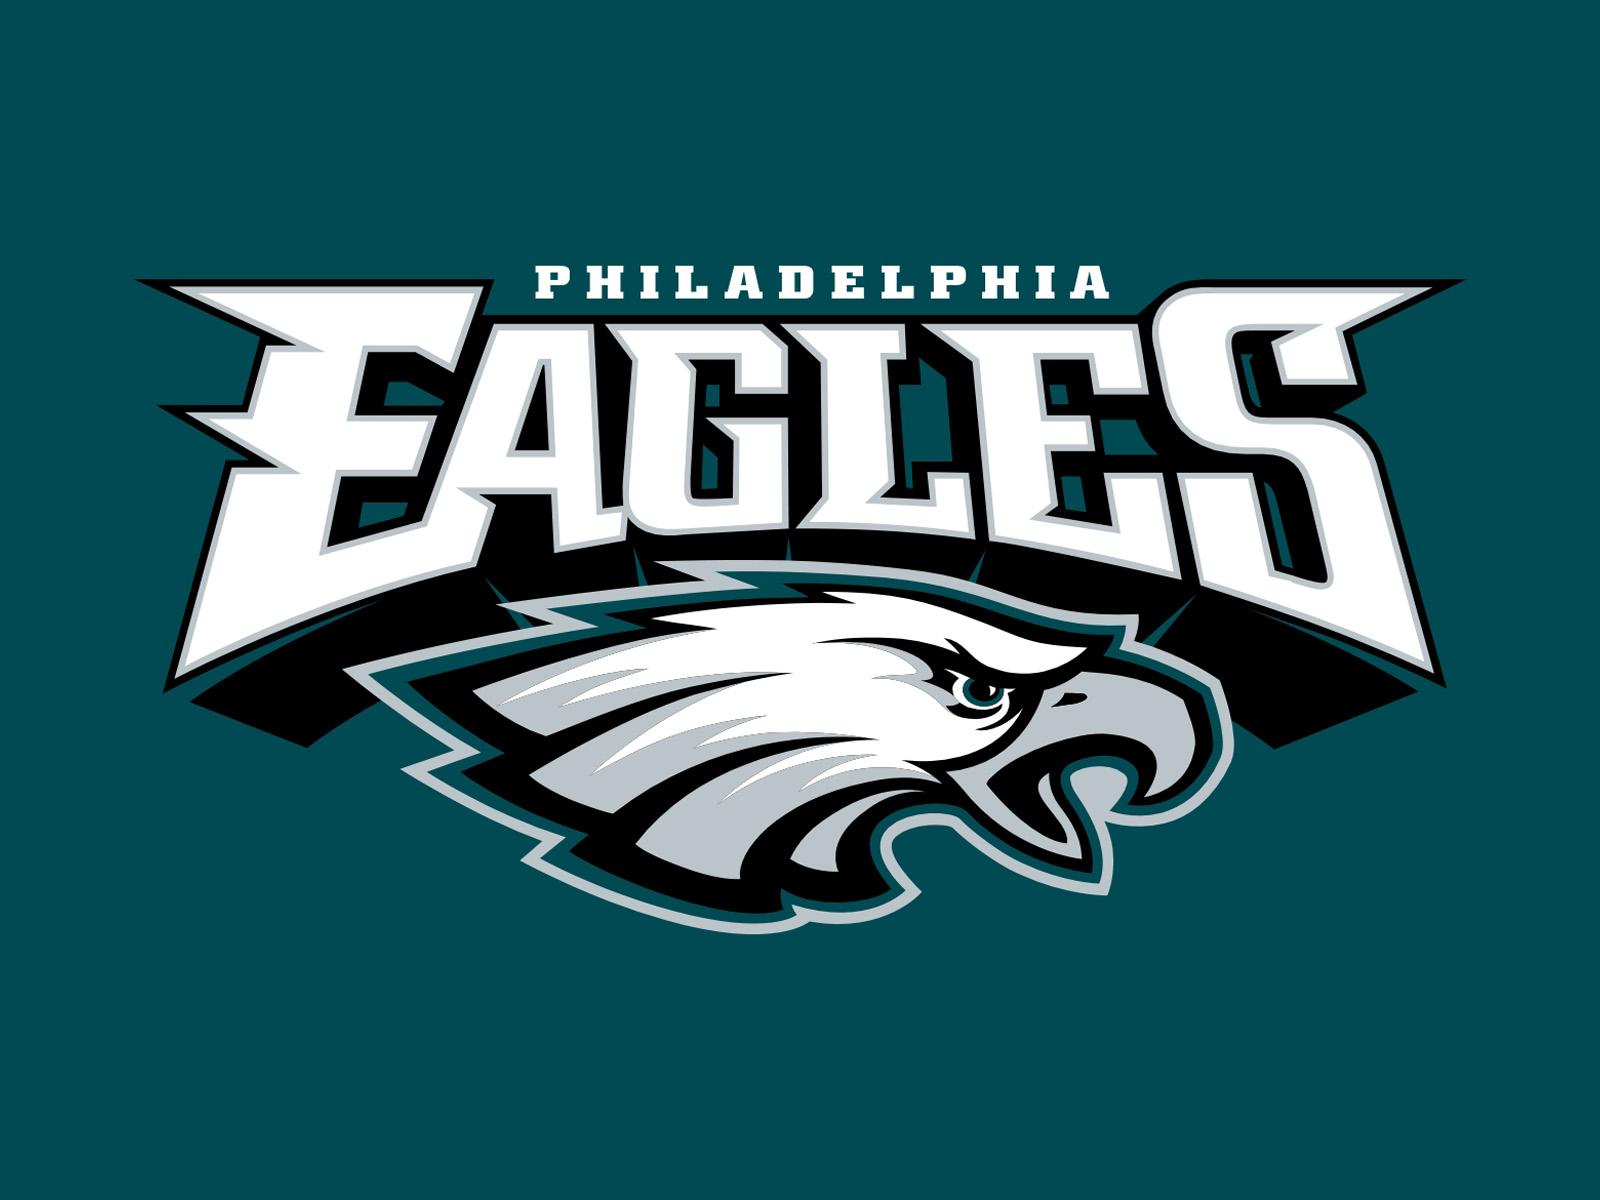 Some Super Bowl Champion Philadelphia Eagles Logo Wallpapers For You